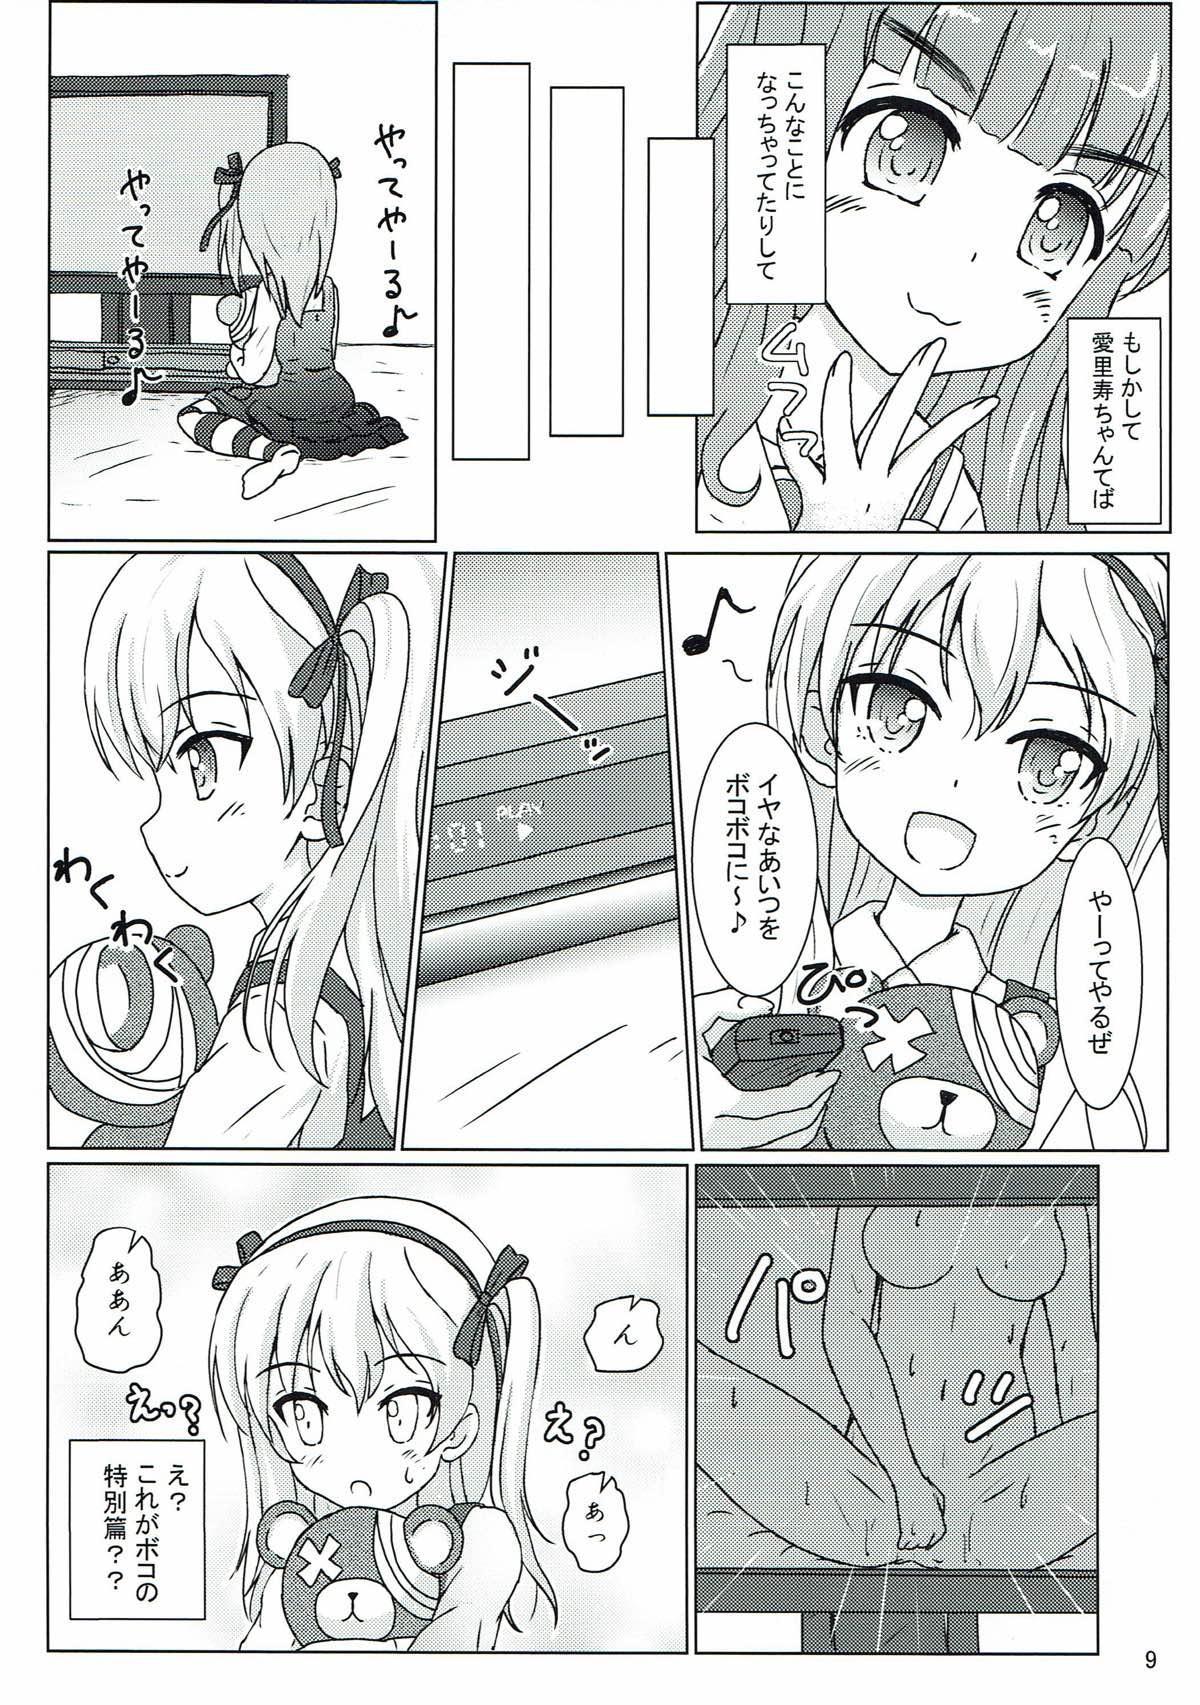 Totsugeki! Mousou Senshadou 6